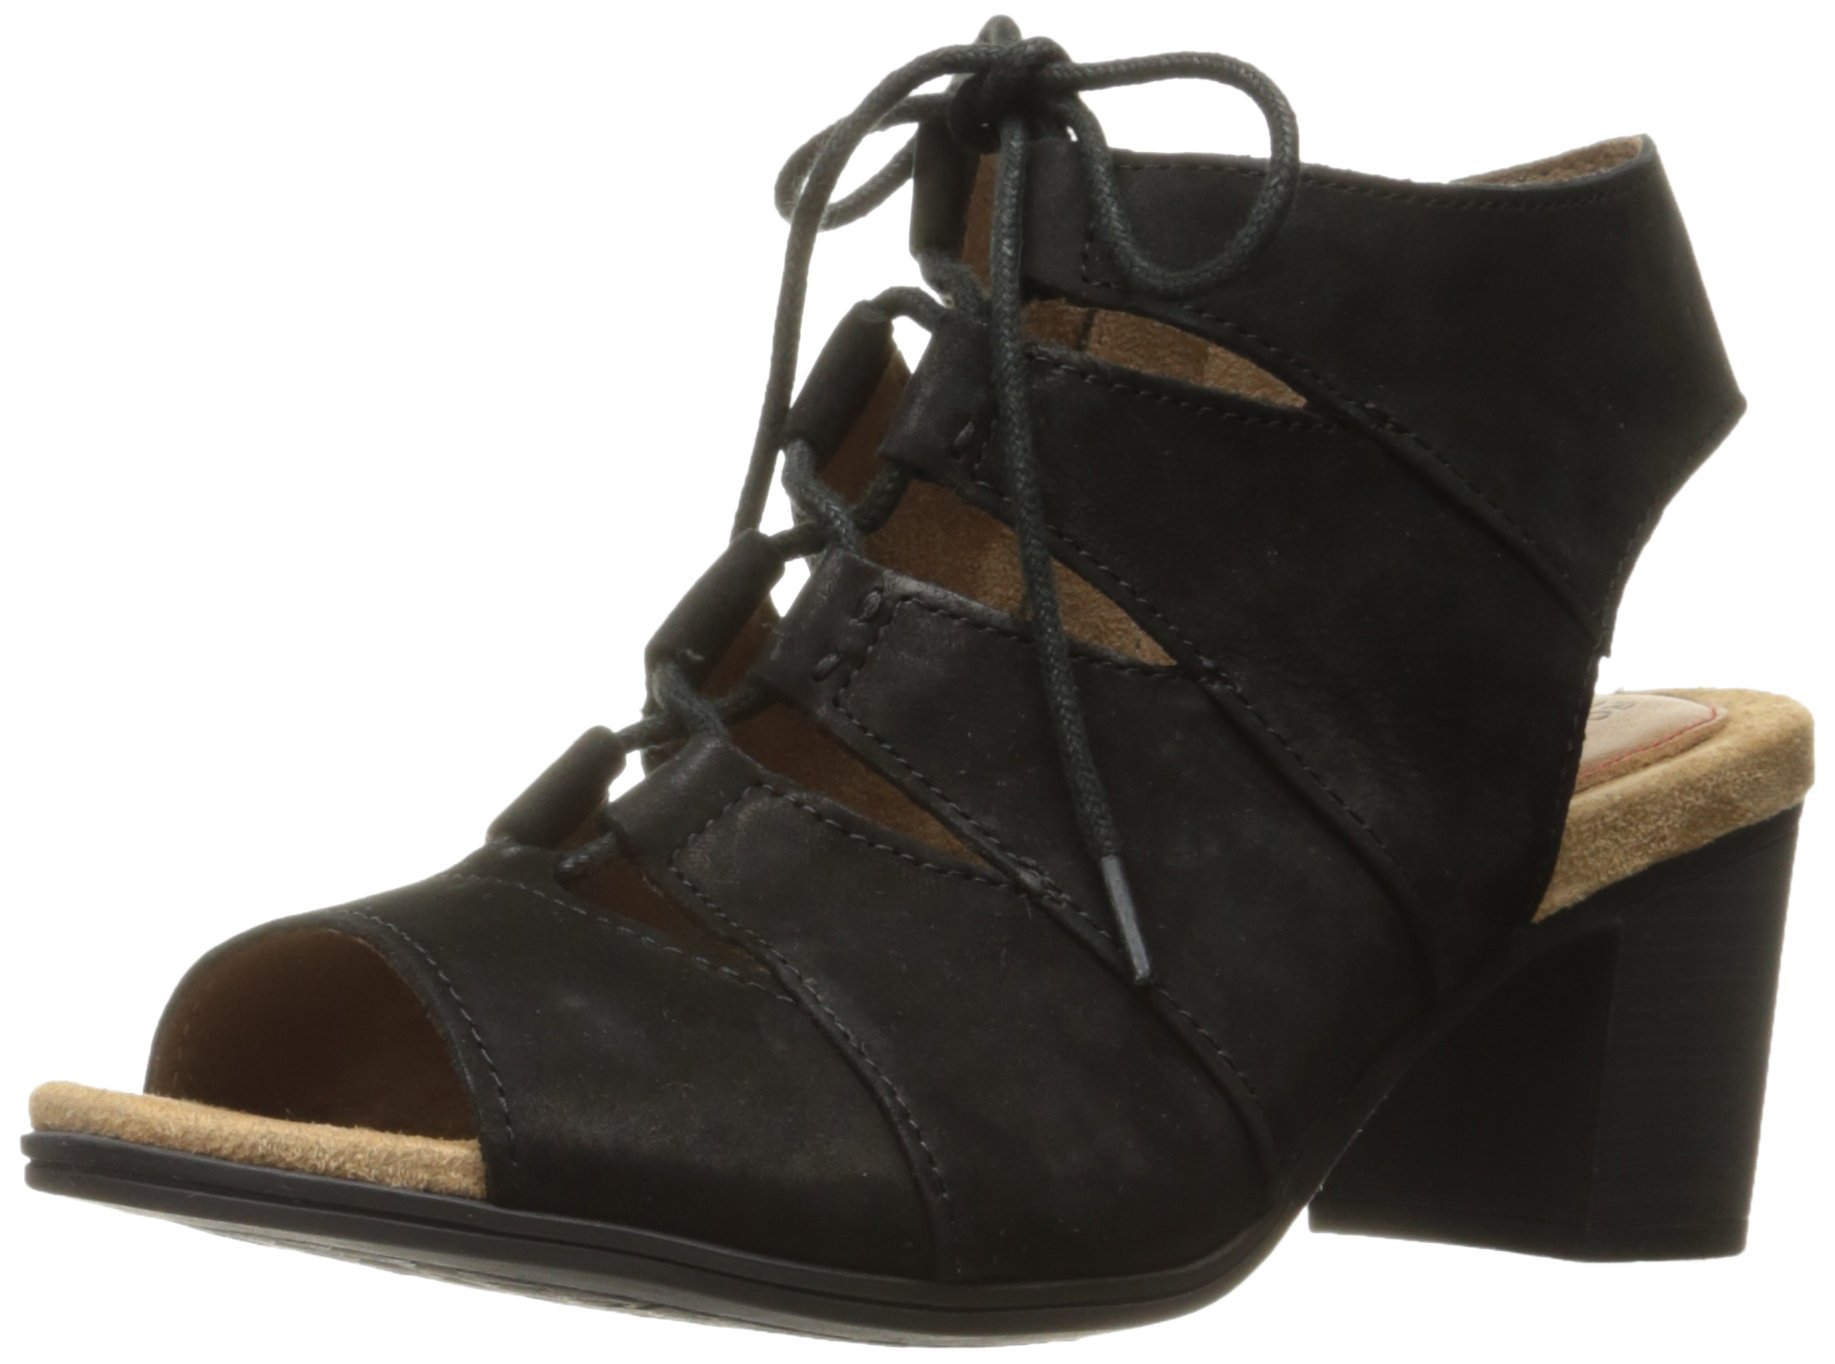 Rockport Women's Hattie Laceup Heeled Sandal, Black, 8 M US